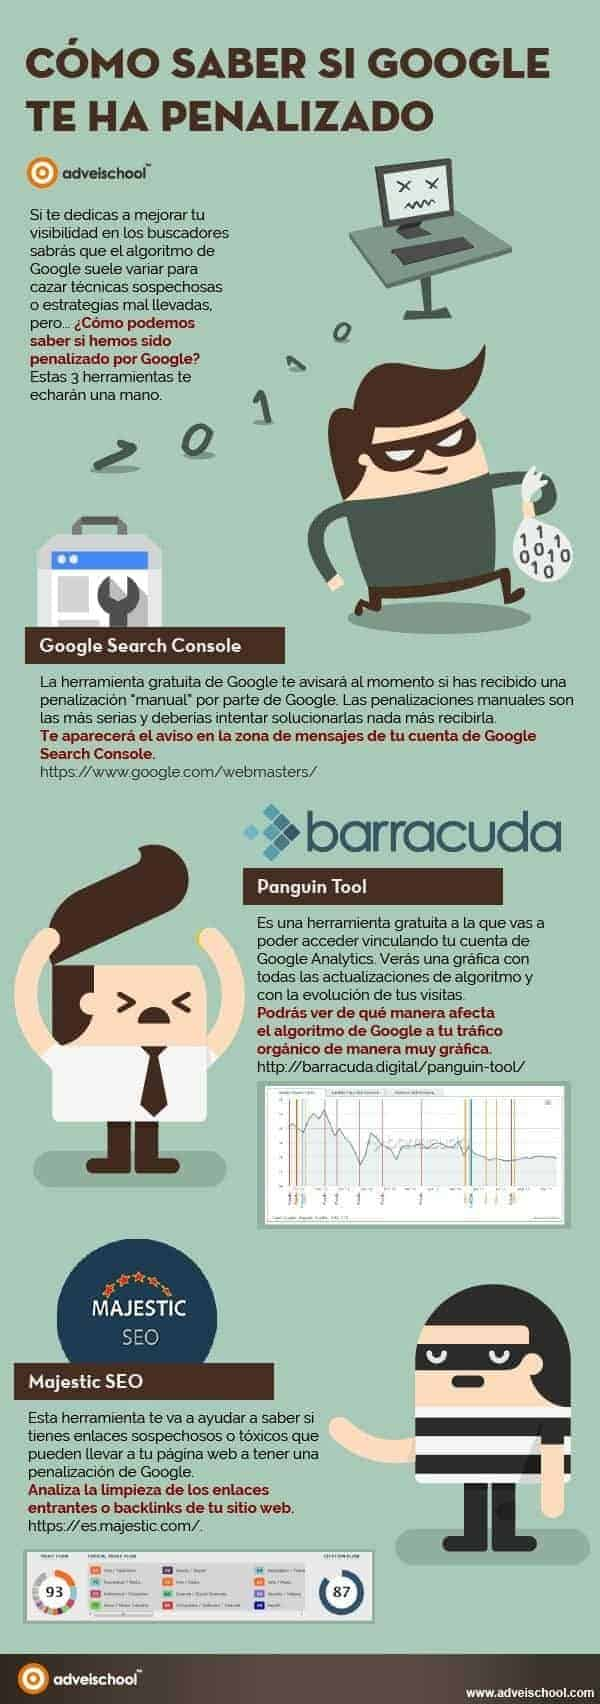 penalizaciones-google-infografia